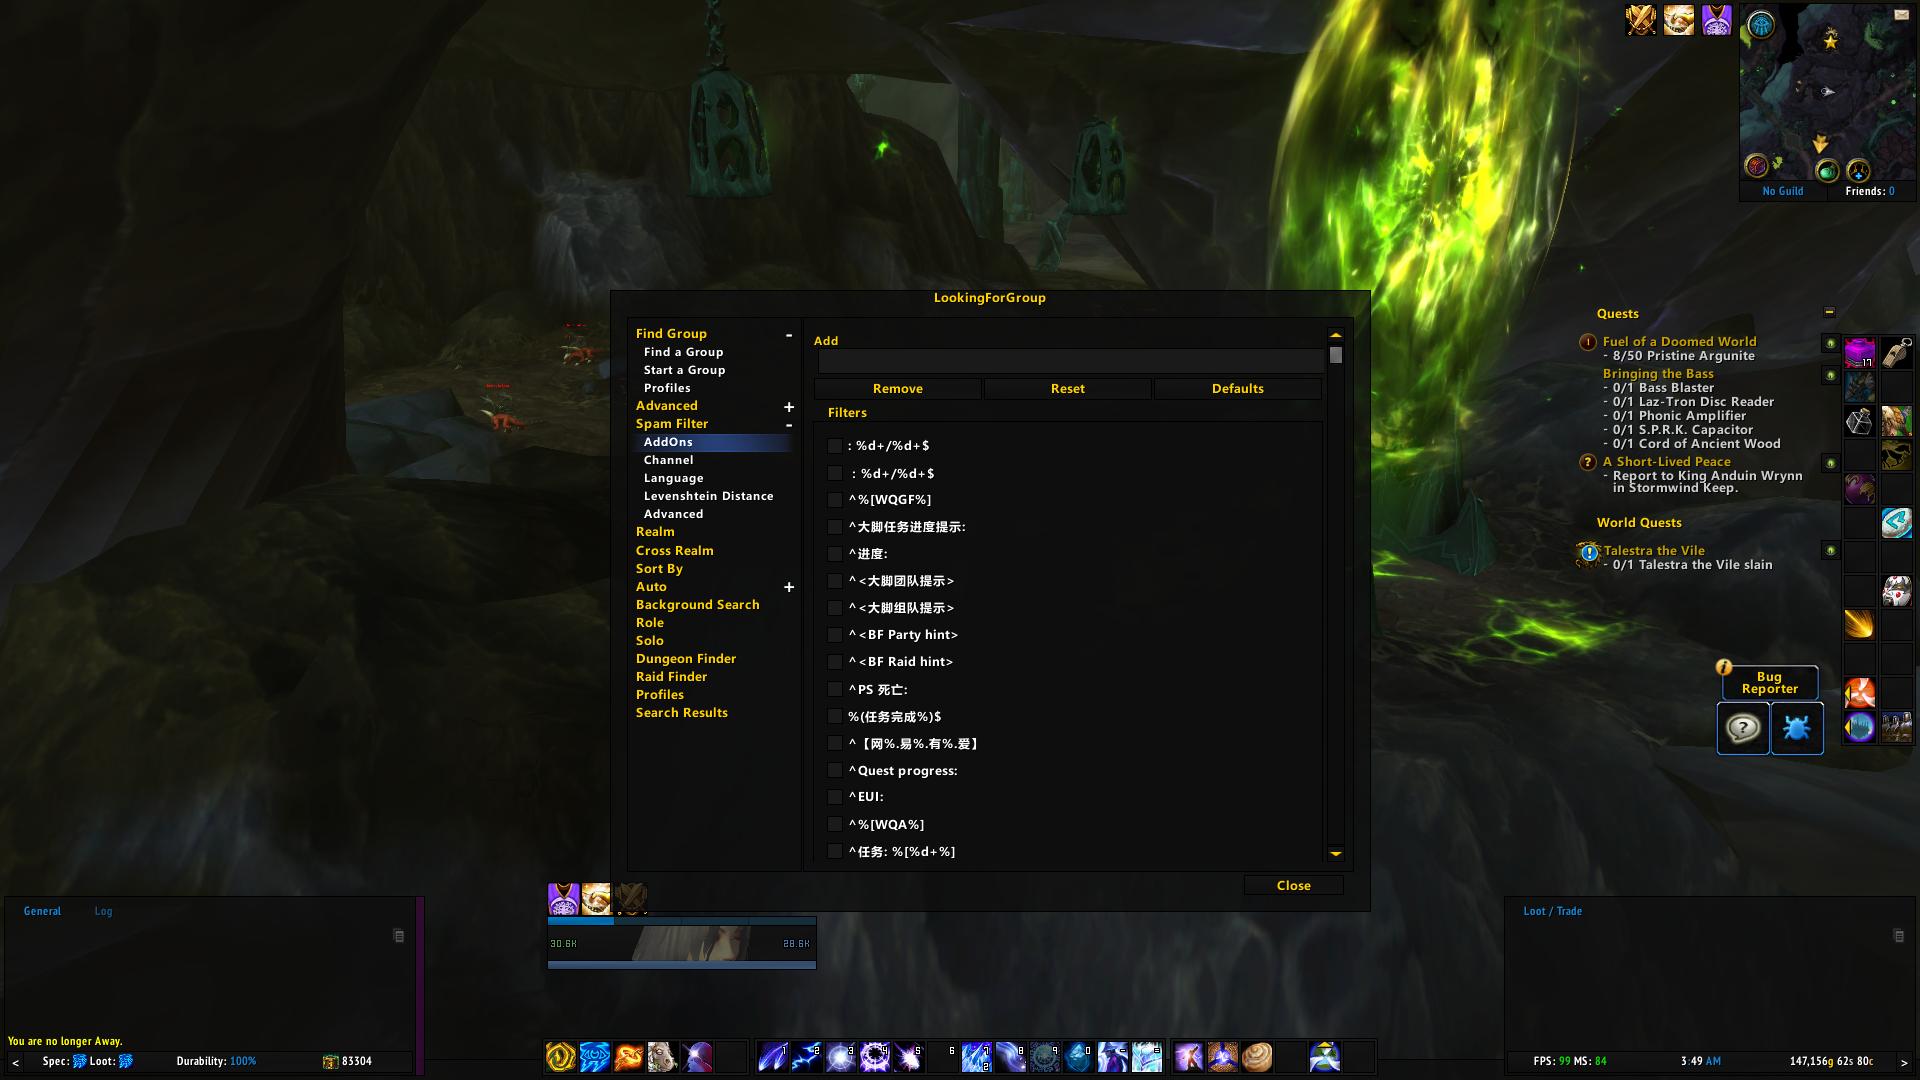 LookingForGroup (LFG) - Addons - World of Warcraft - CurseForge